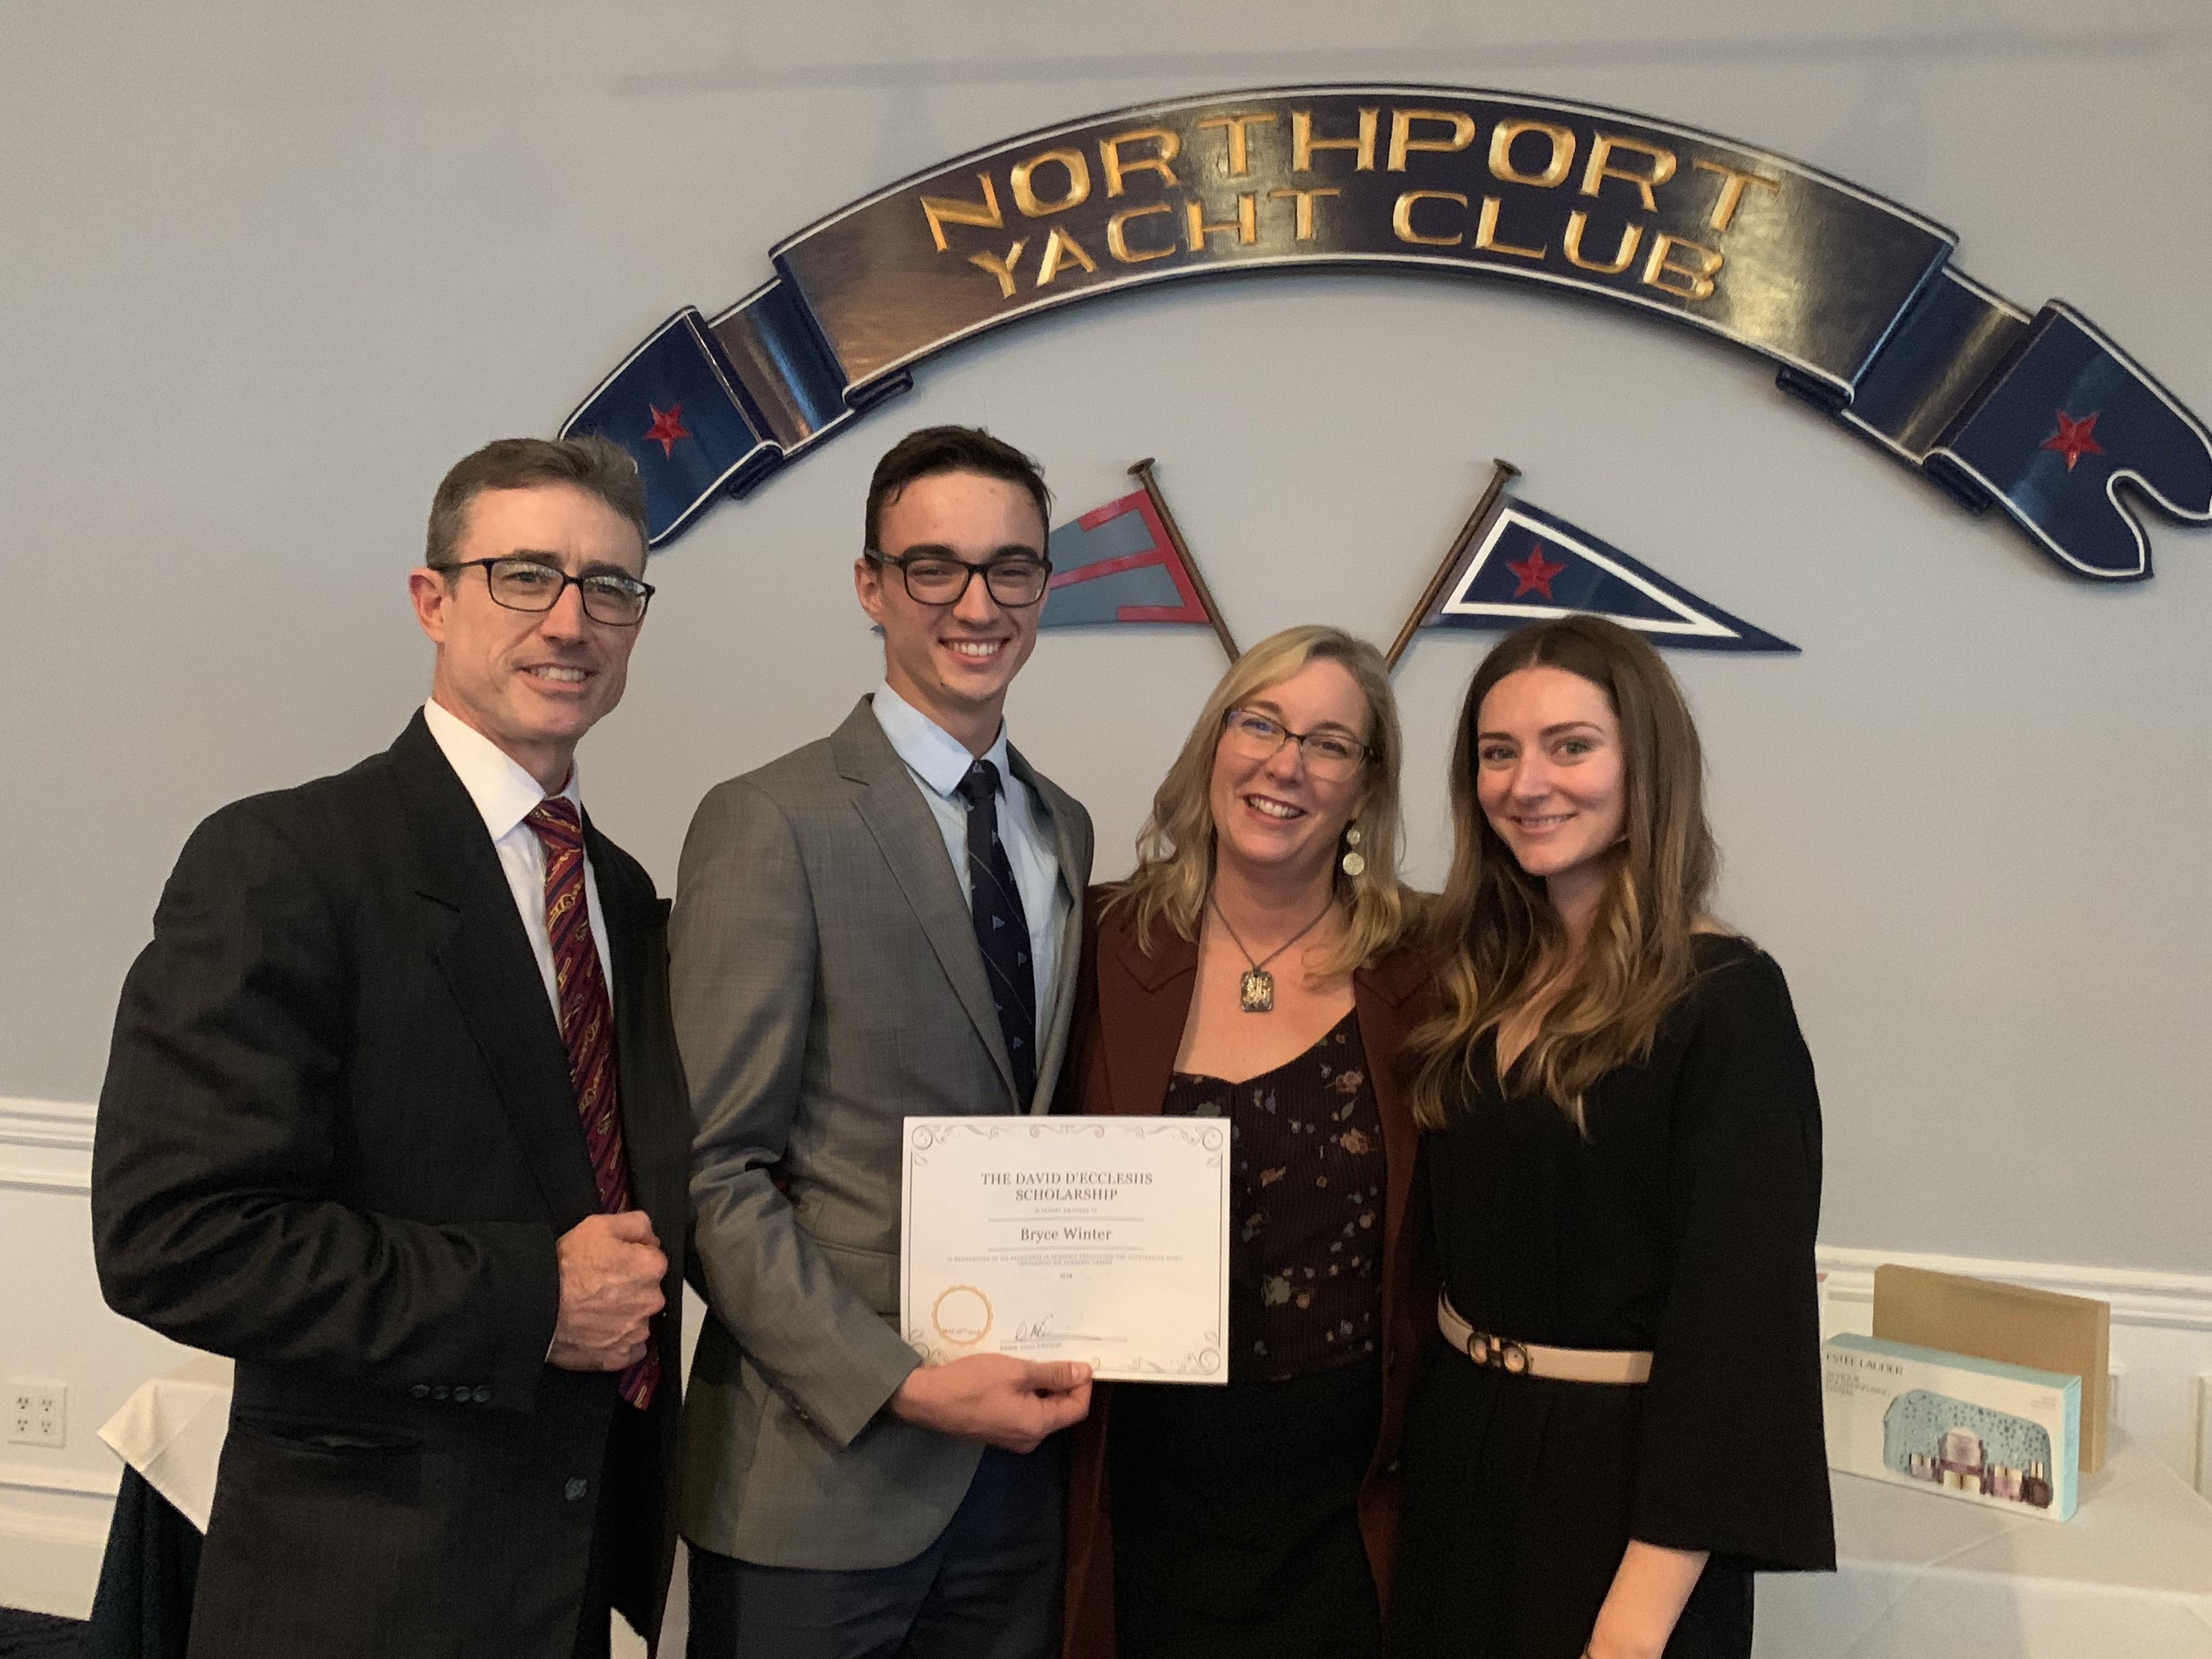 The David D'Ecclesiis Memorial Scholarship Award